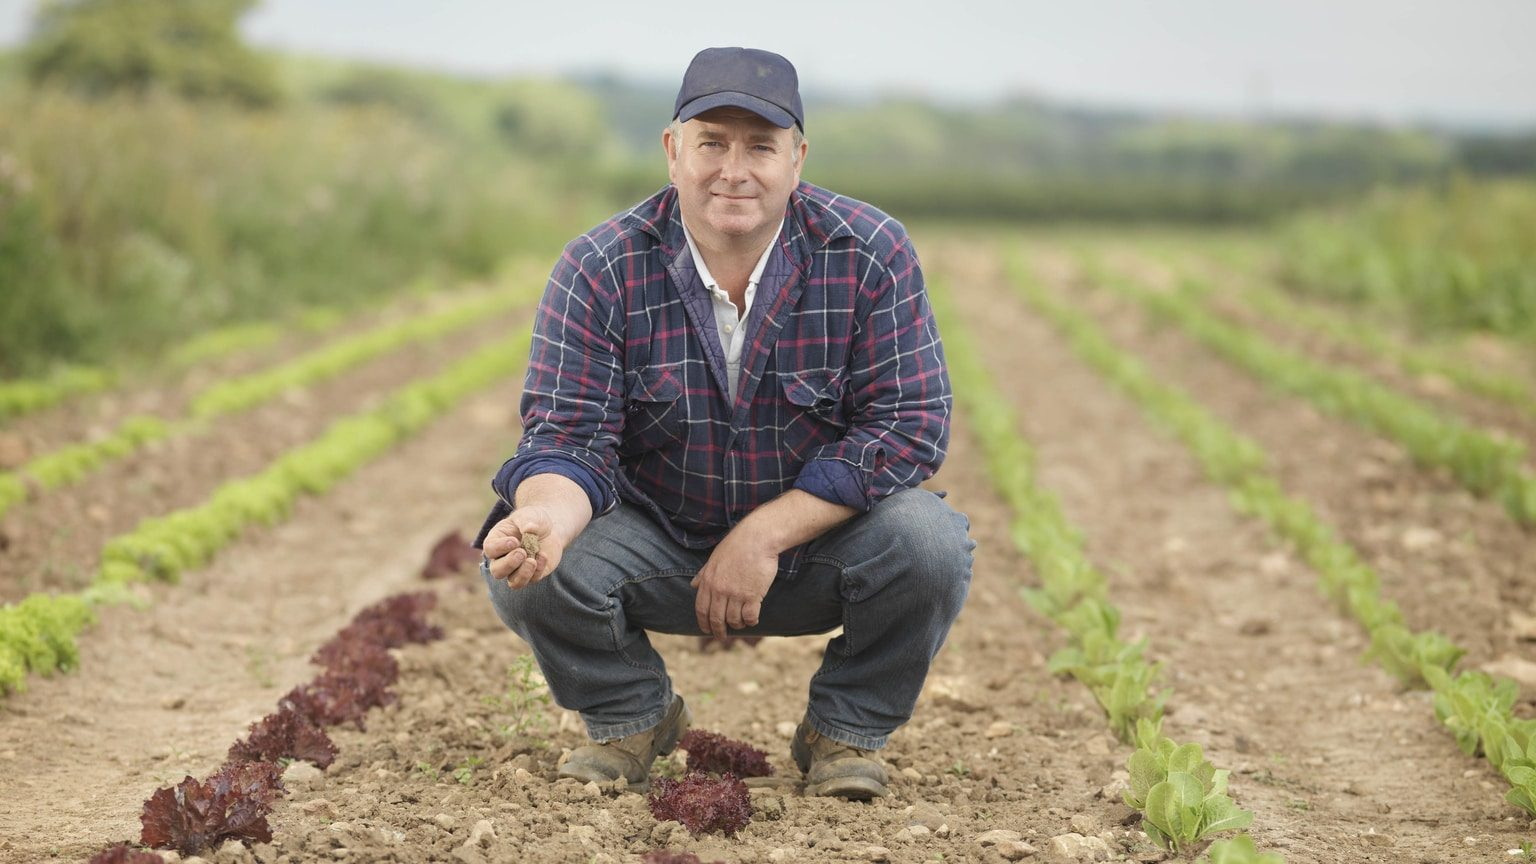 Farmer in a field managing crops